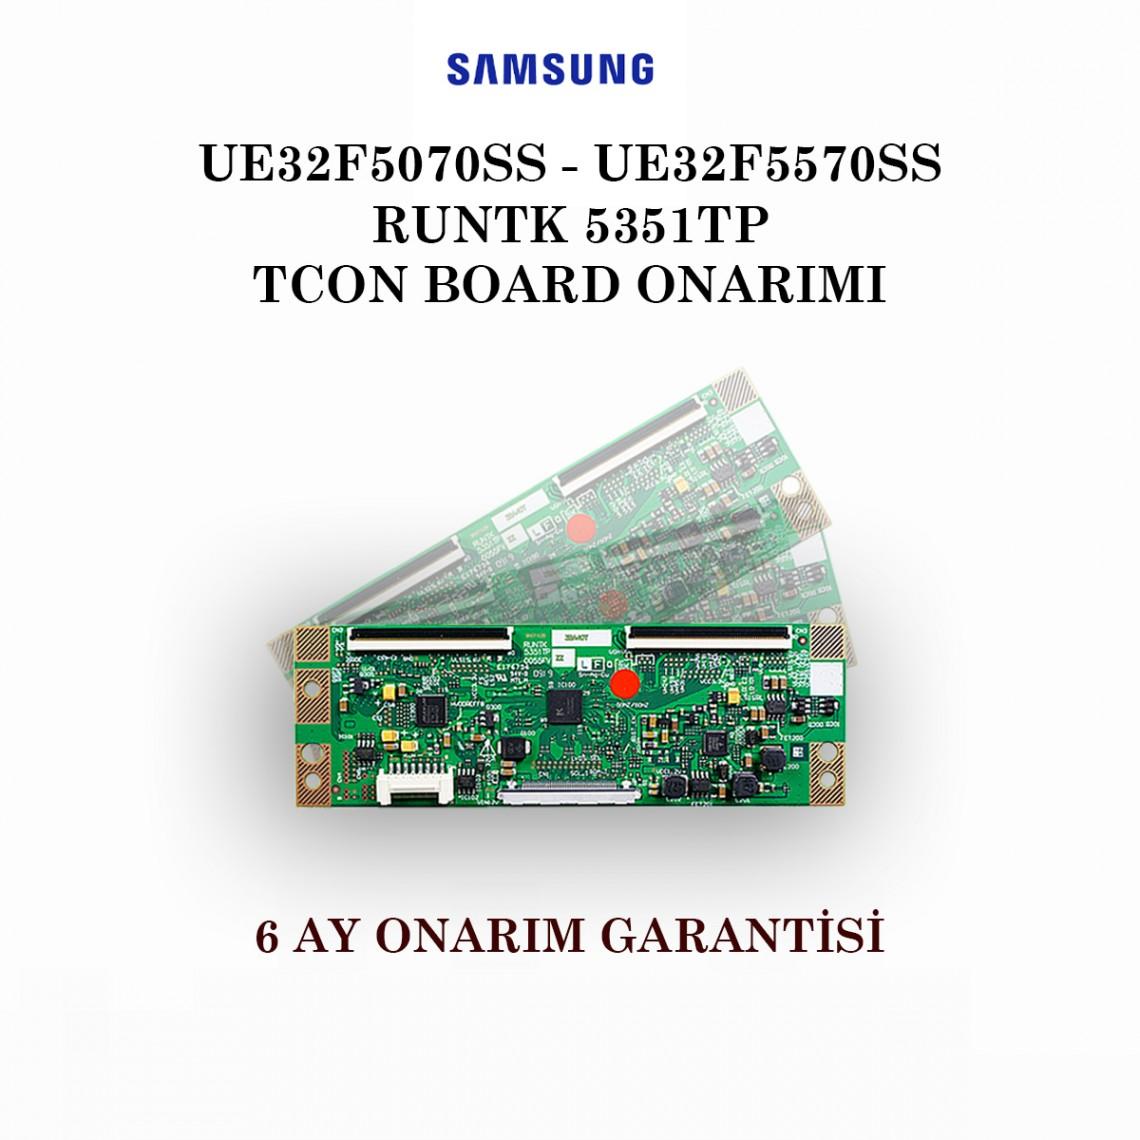 SAMSUNG , RUNTK 5351TP ,  5351TPZA , CY-HF320BGSV1H,  UE32F5070 , UE32F5570 , Tcon Board Onarımı